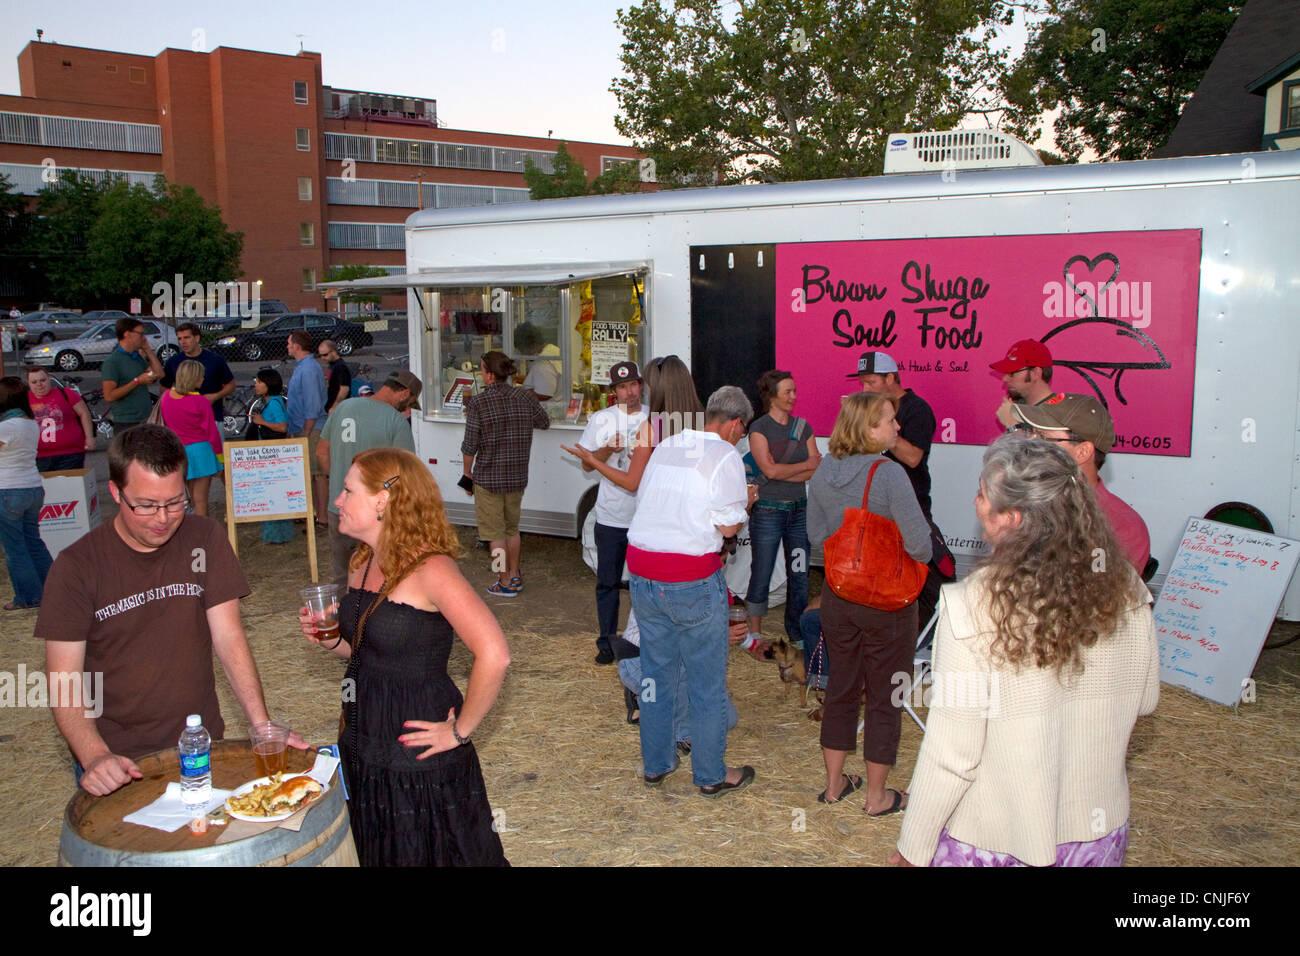 Food truck rally in Boise, Idaho, USA. - Stock Image